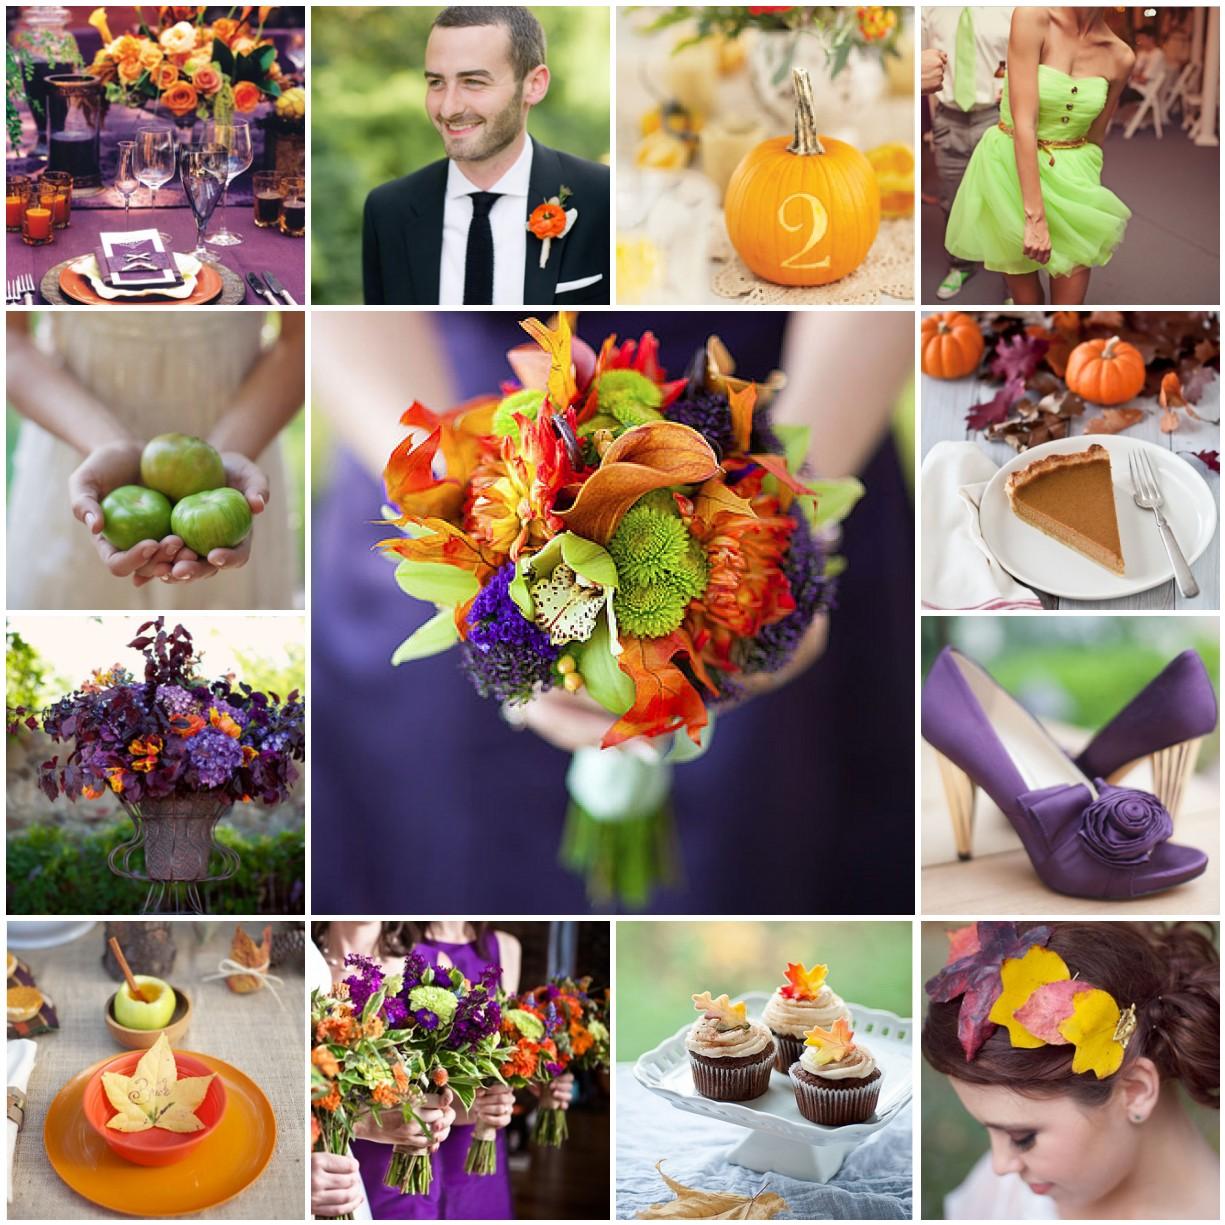 Wedding Colors: Fall Orange, Plum, Green Wedding